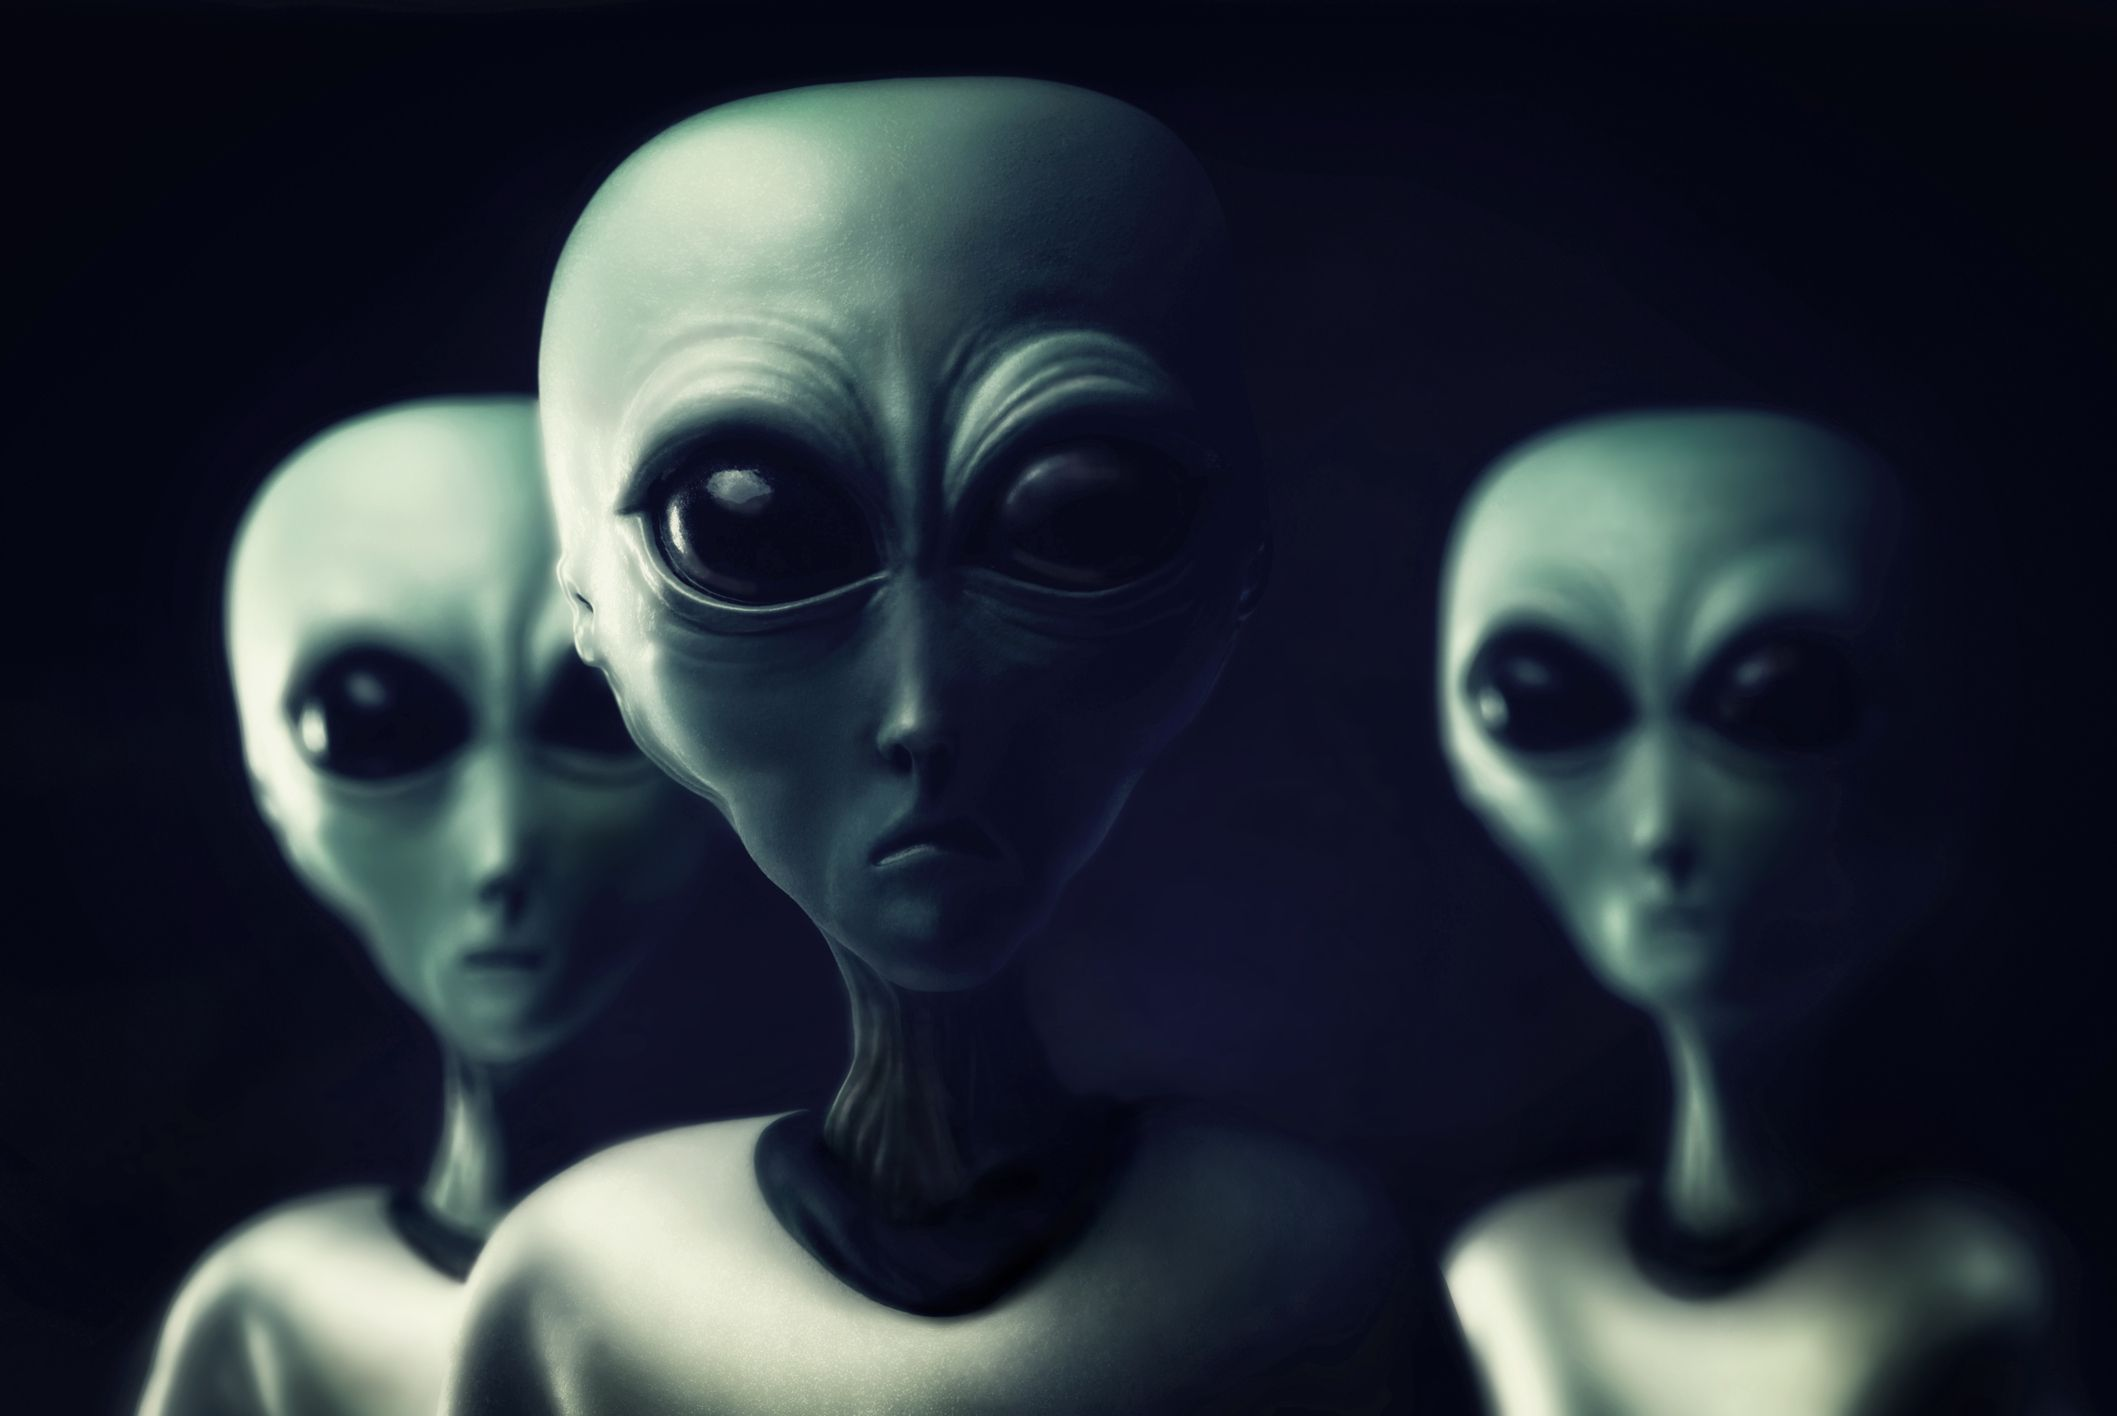 Three aliens.